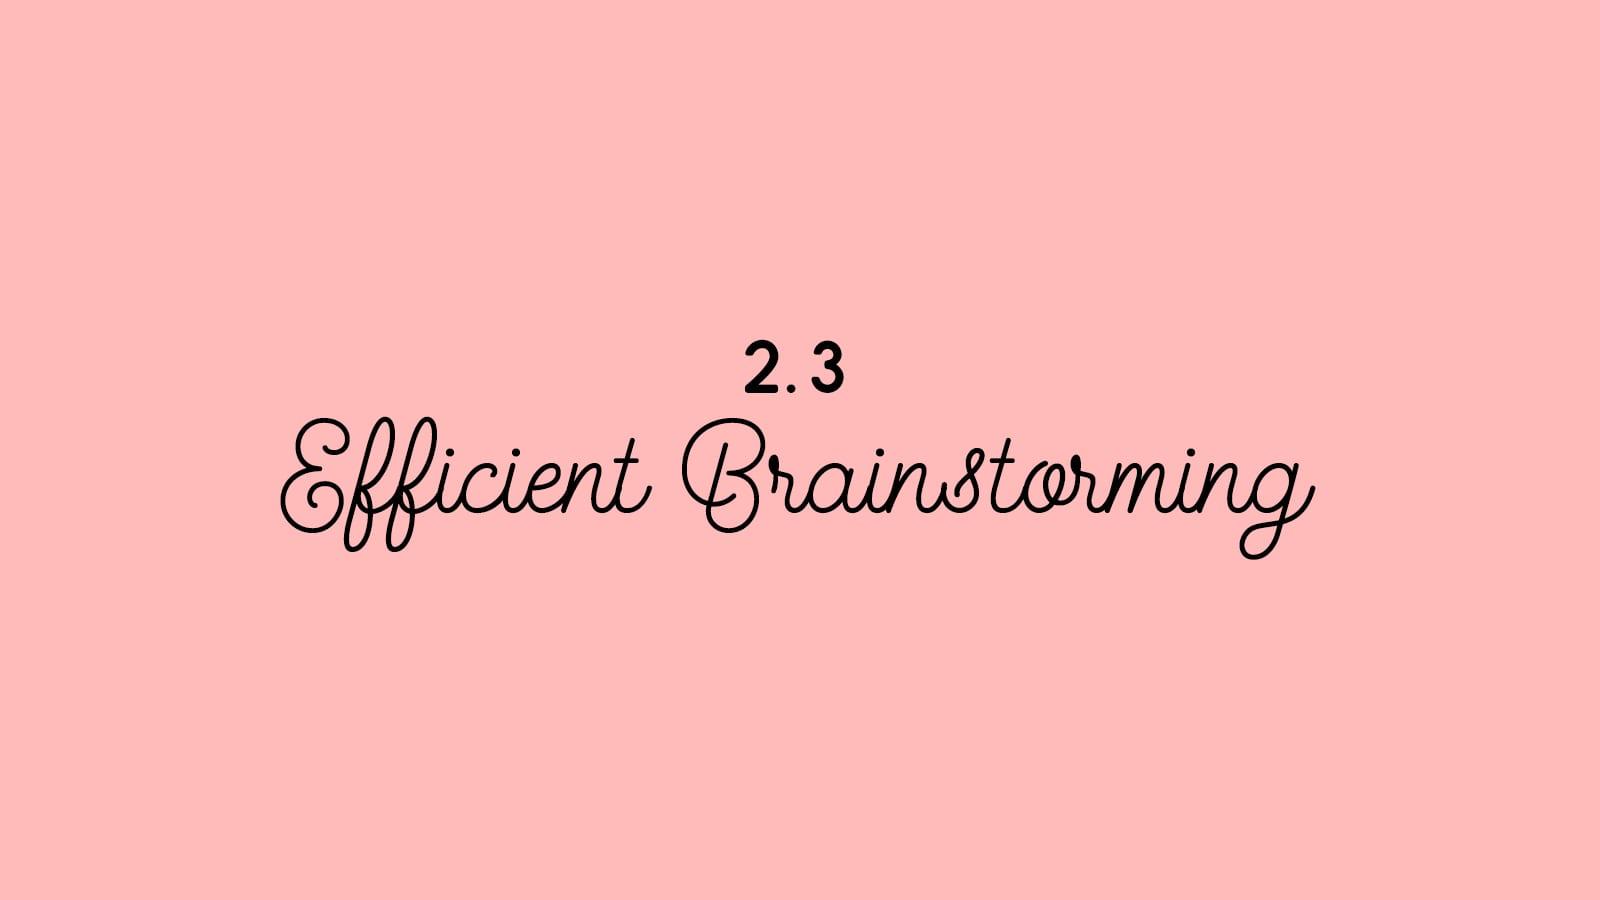 2.3 Efficient Brainstorming